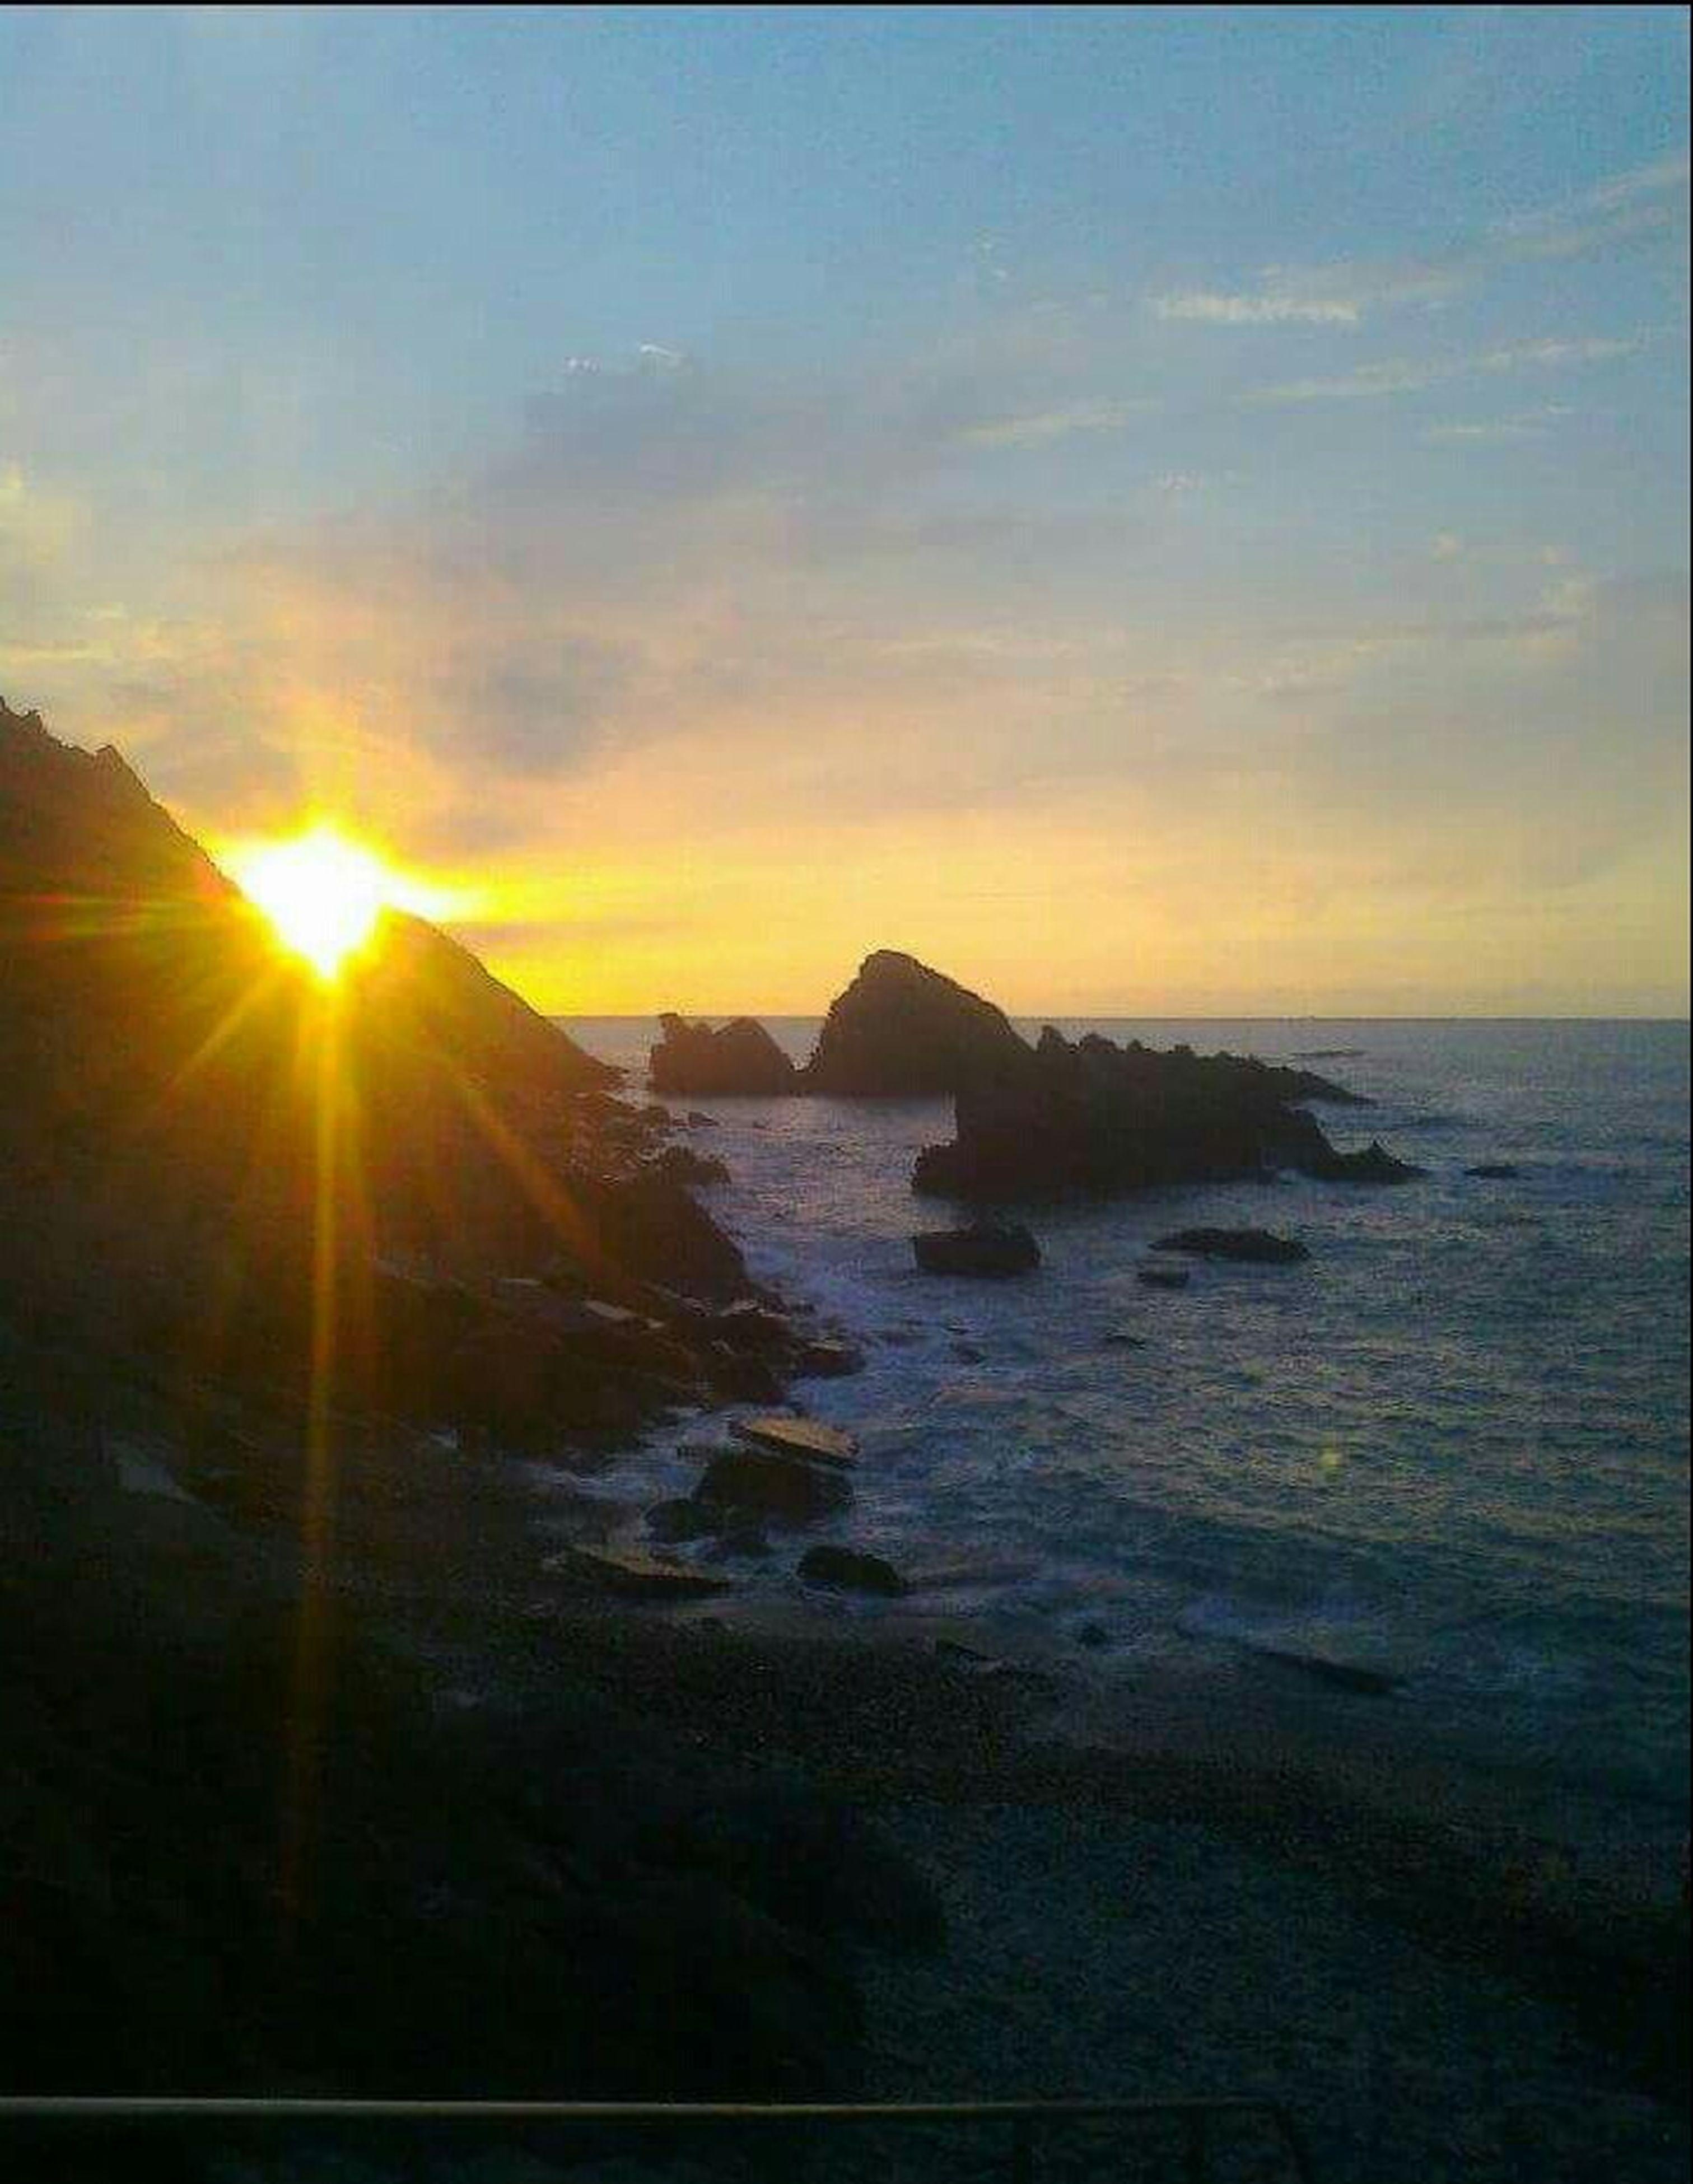 sea, water, sunset, sun, scenics, tranquil scene, horizon over water, beauty in nature, sky, tranquility, beach, sunlight, nature, shore, sunbeam, idyllic, rock - object, wave, reflection, lens flare